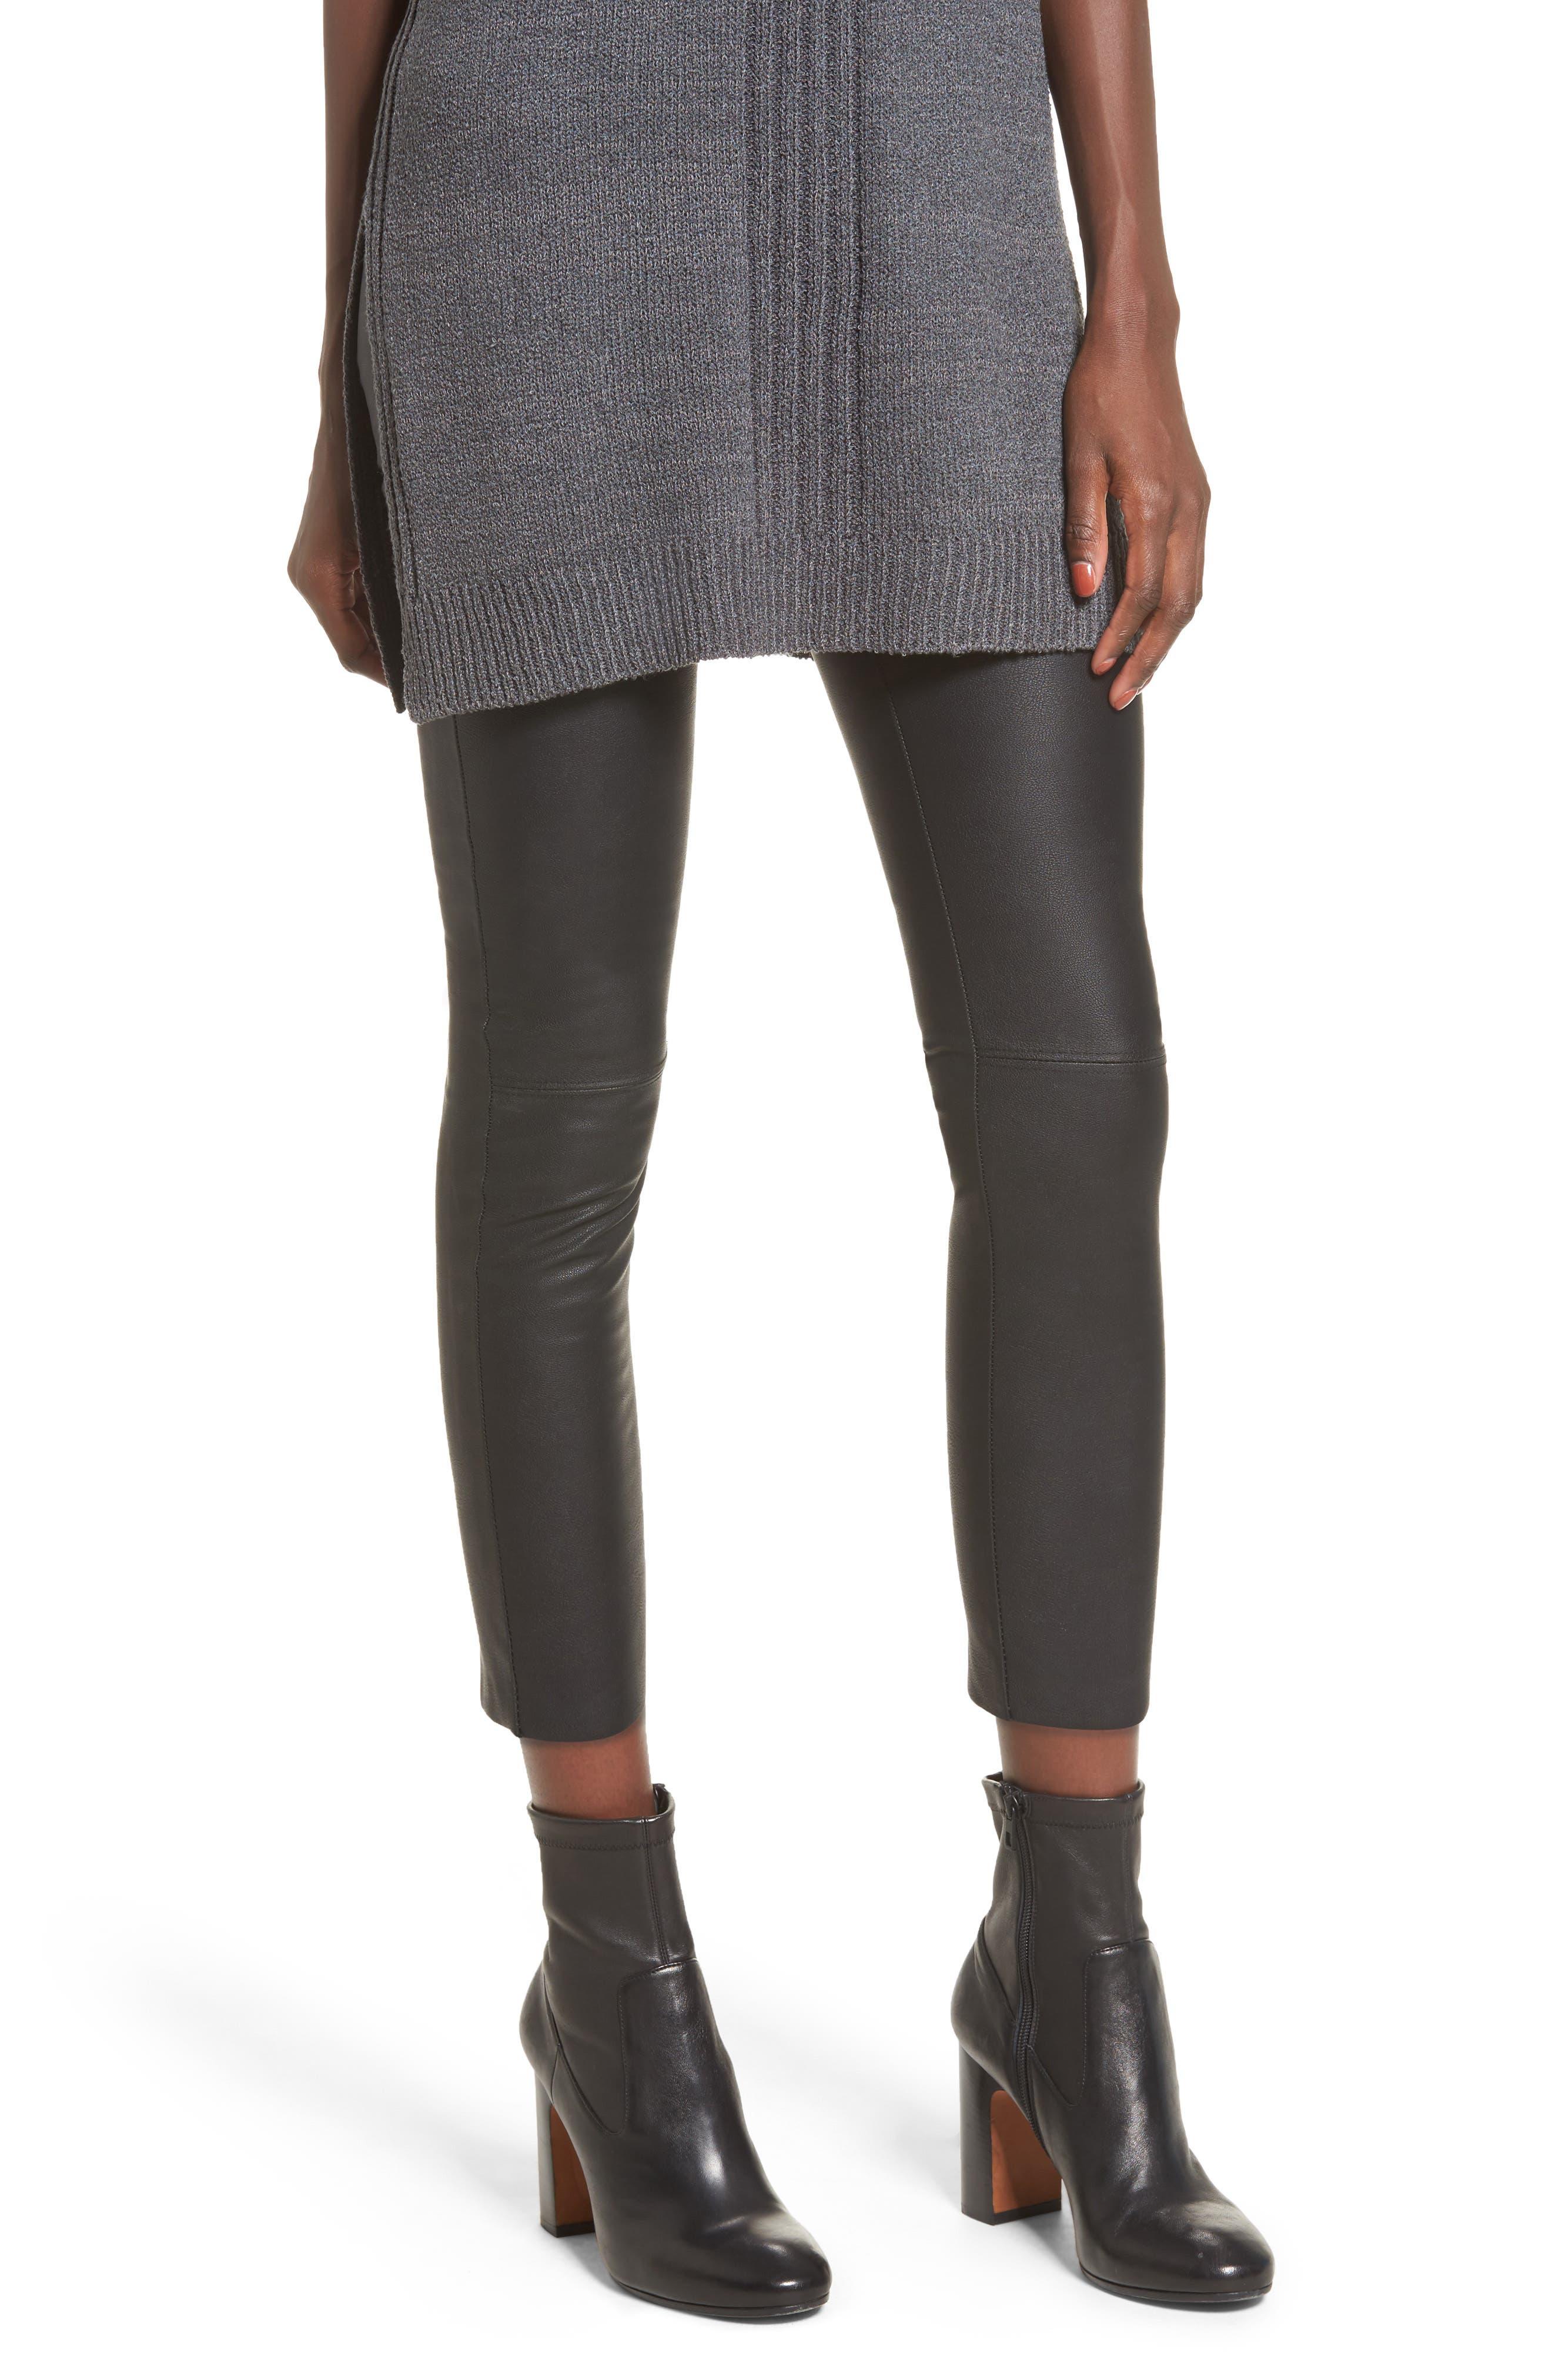 e68d4b0b095 Women s Faux Leather Pants   Leggings